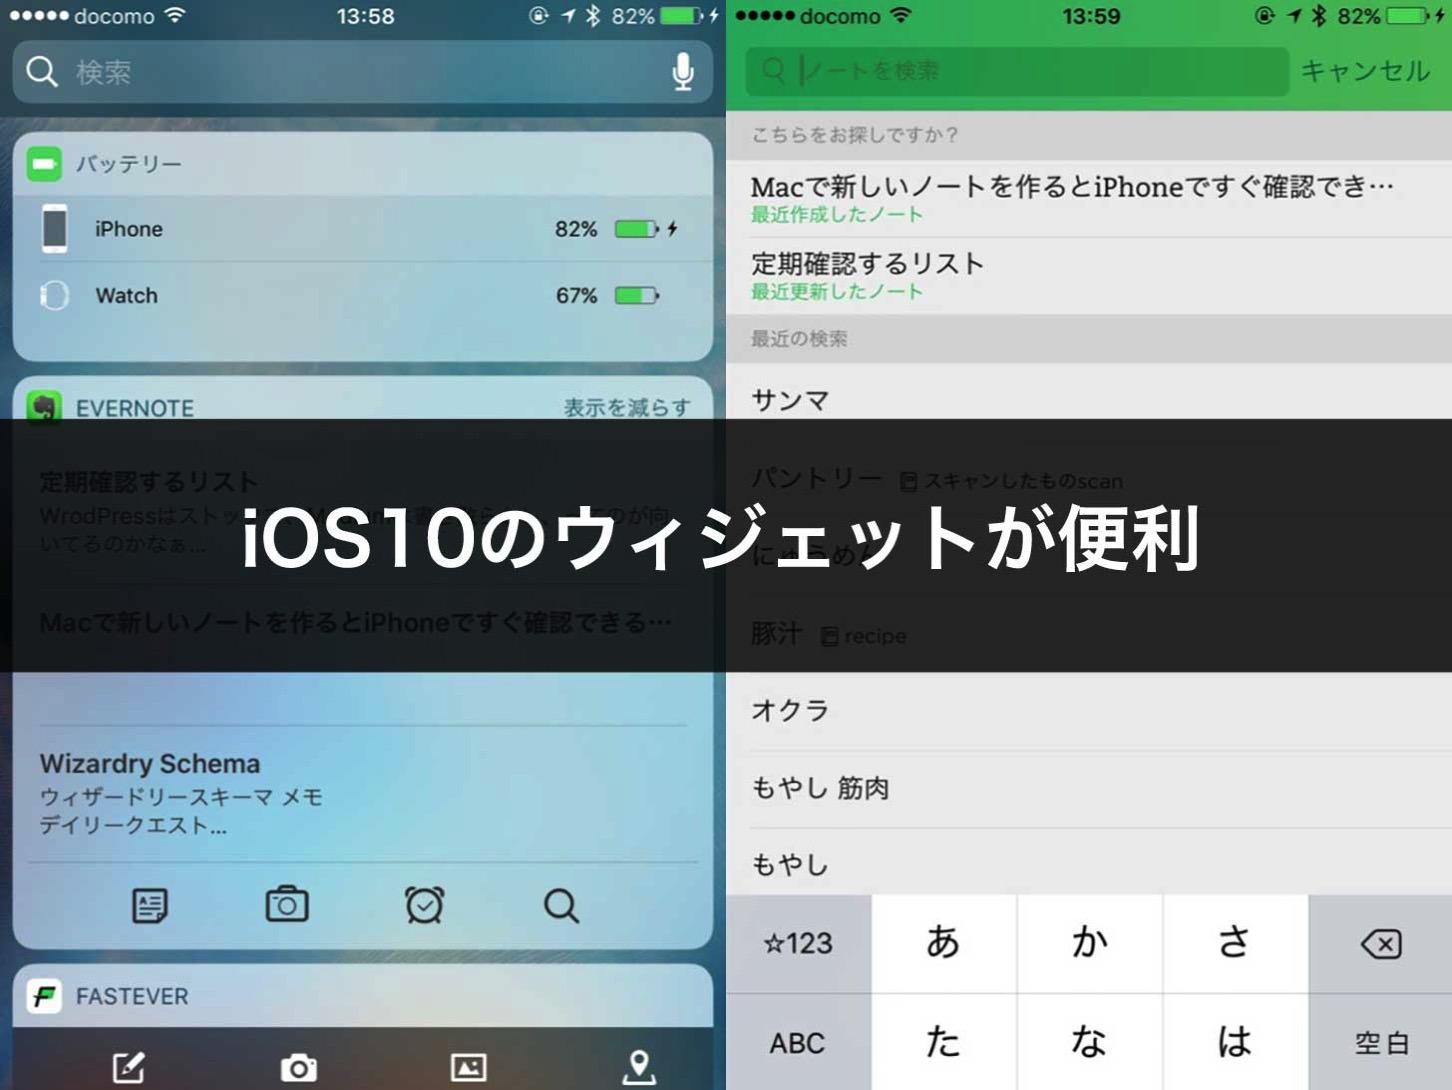 iOS10 ウィジェット